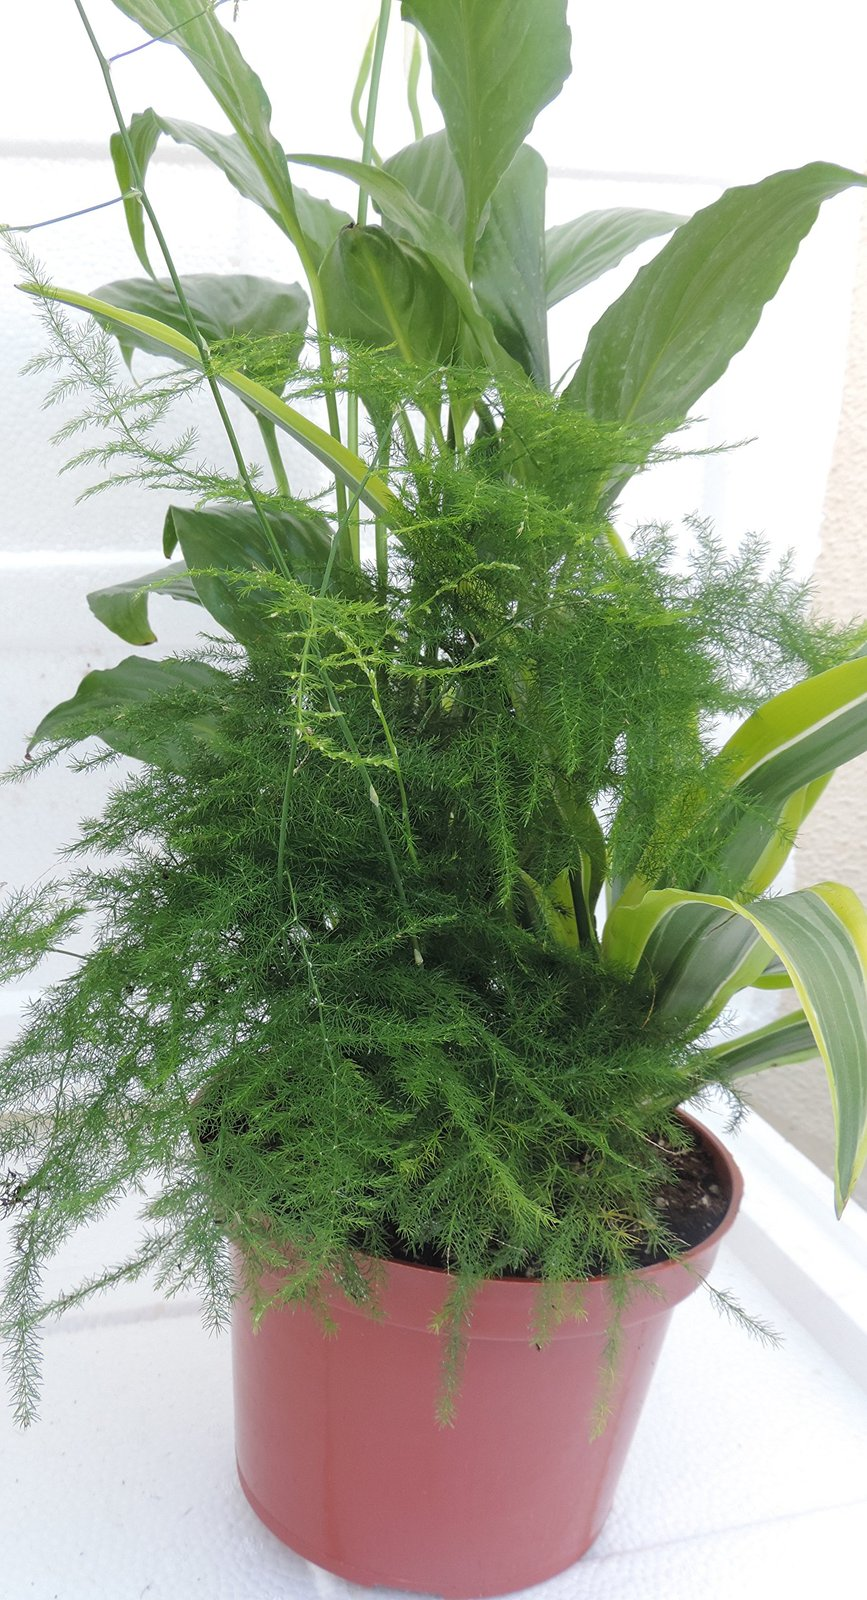 Terrarium & Fairy Garden Plants - 6'' pot -Assortment of 3 Different Plants